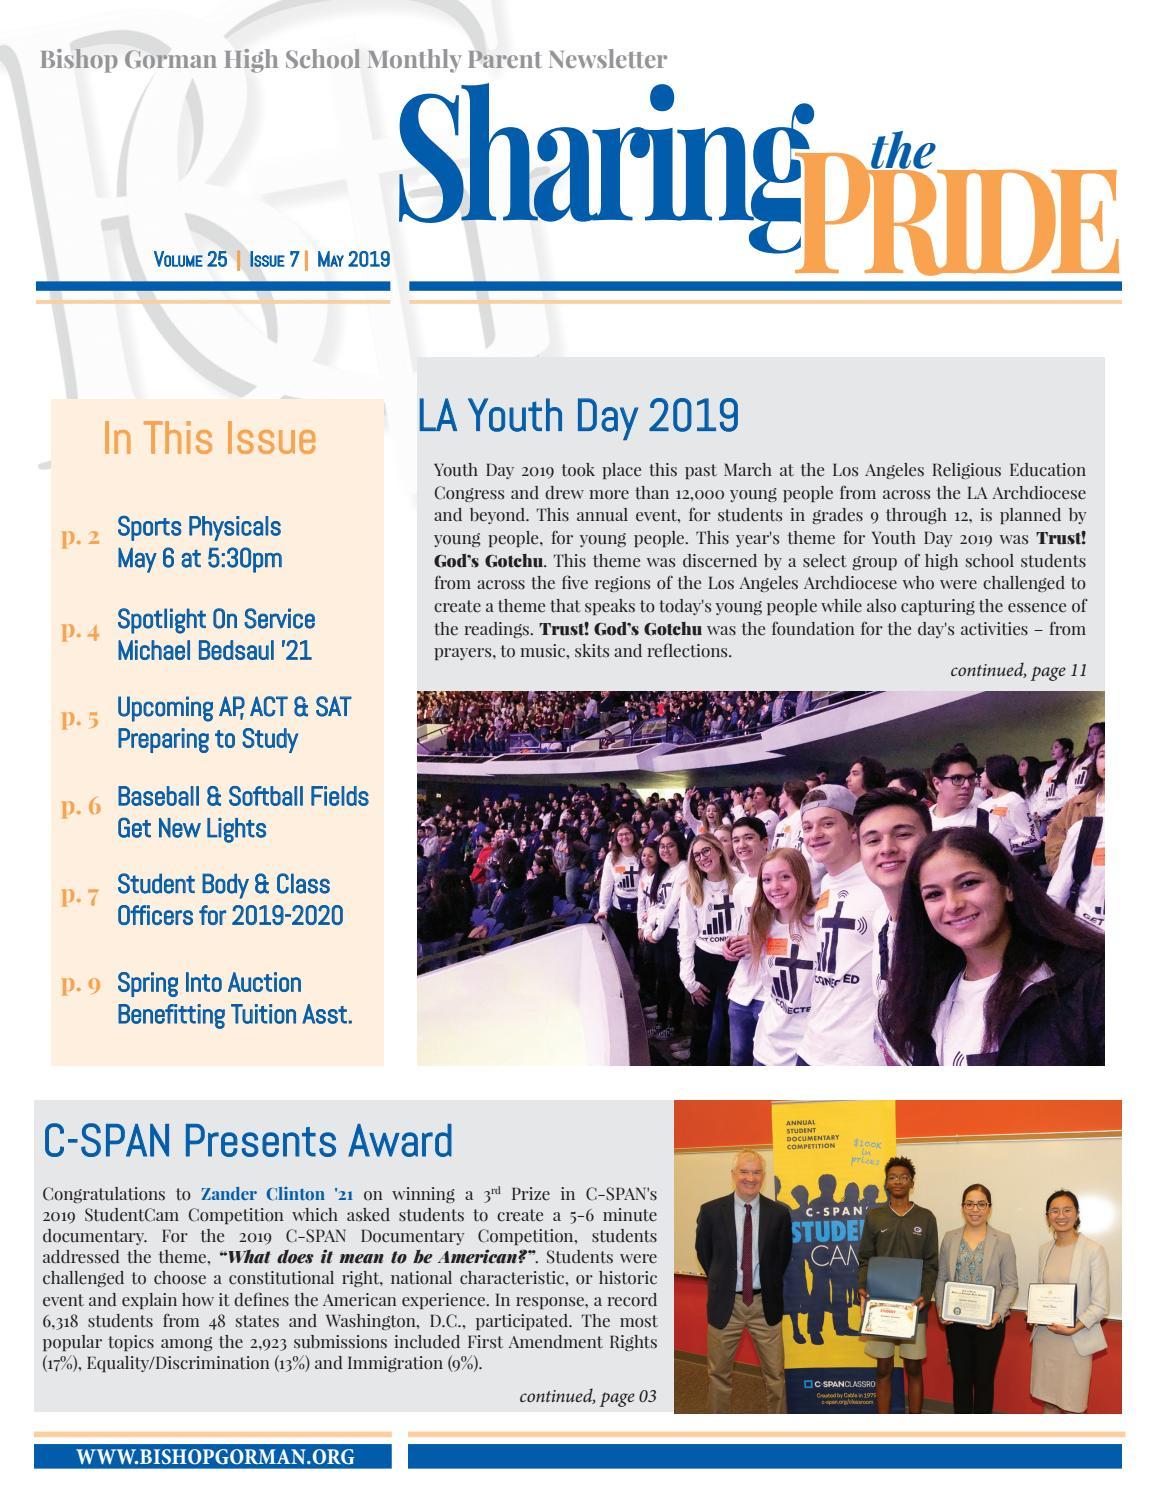 Bishop Gorman High School: Sharing The Pride newsletter, May 2019